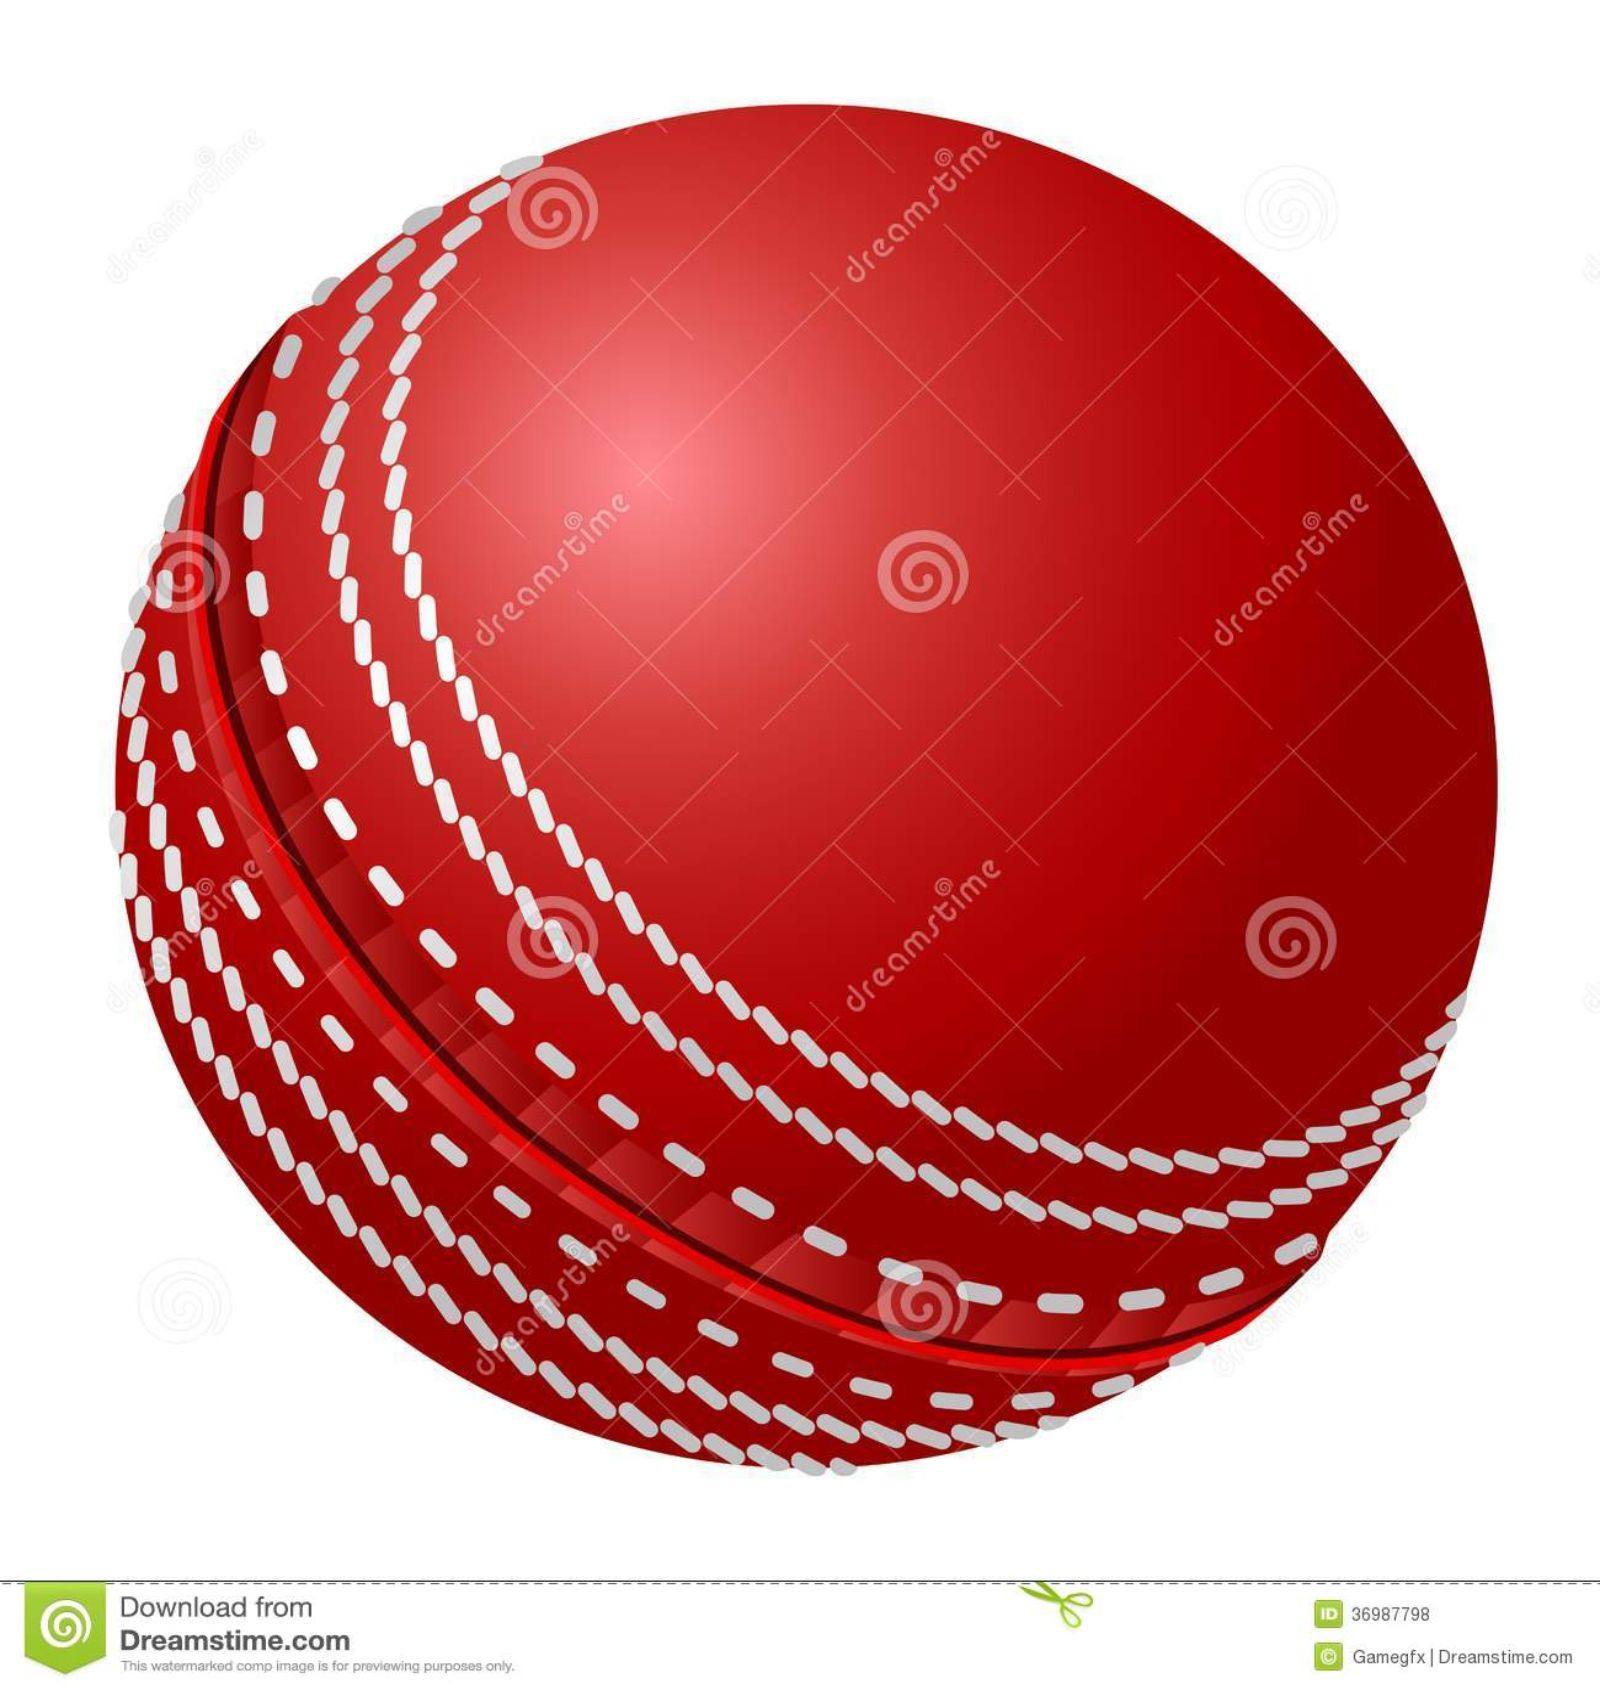 Free download of Cricket vector logos